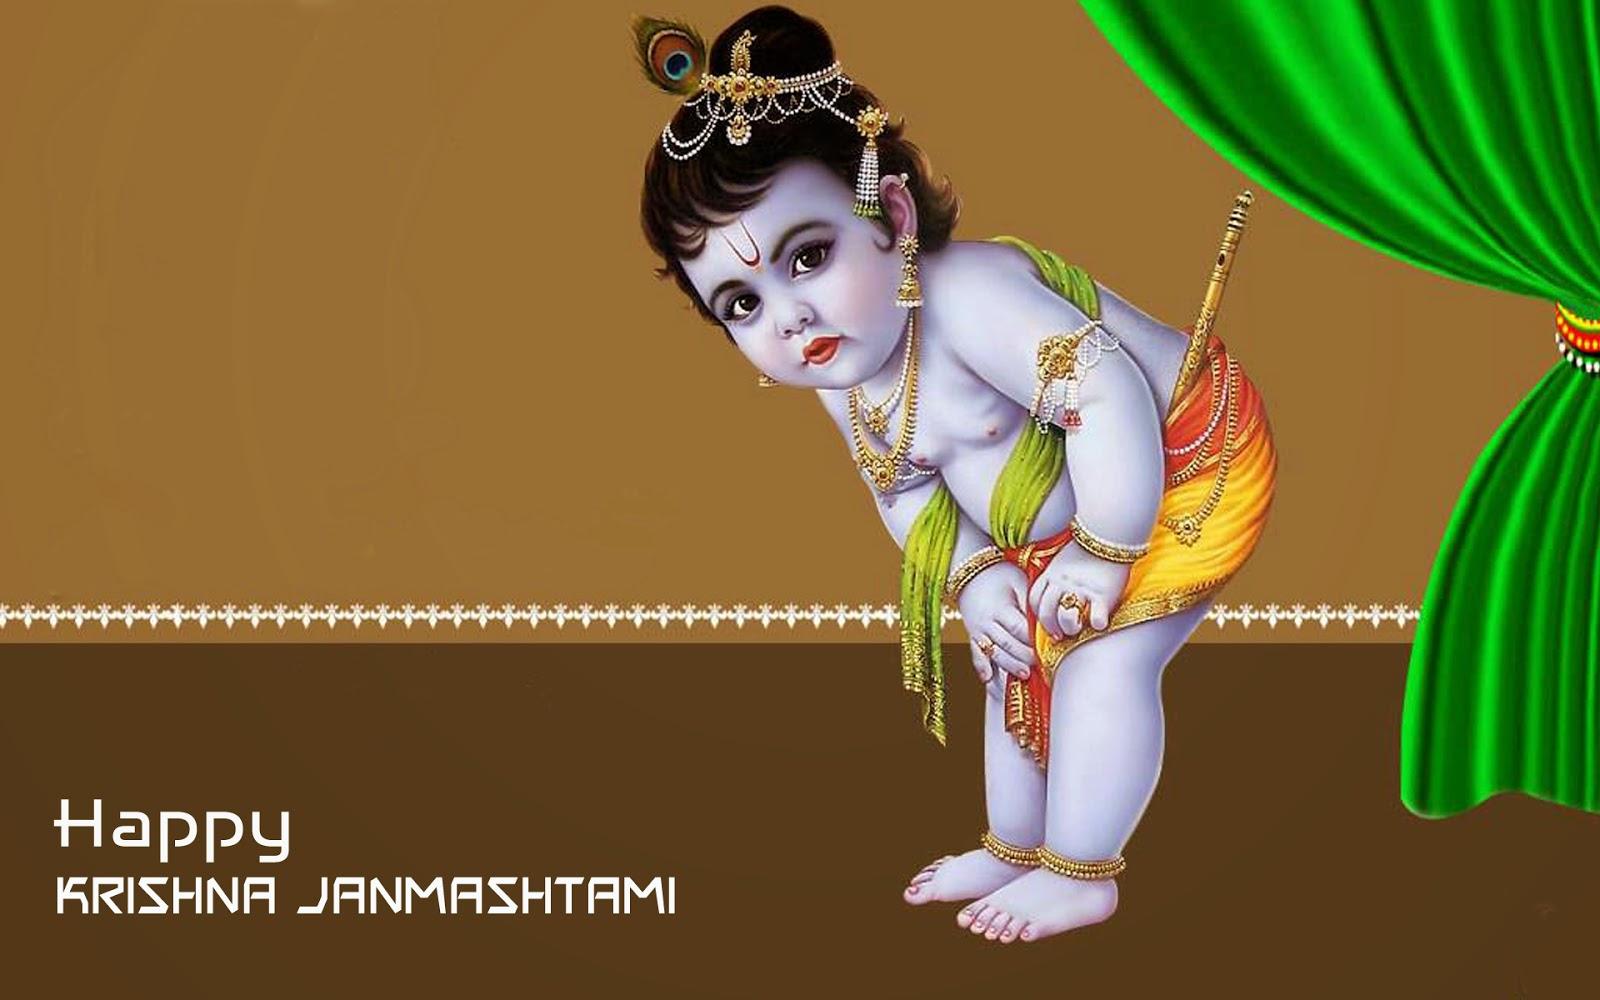 Happy krishna janmashtami hd wallpaper